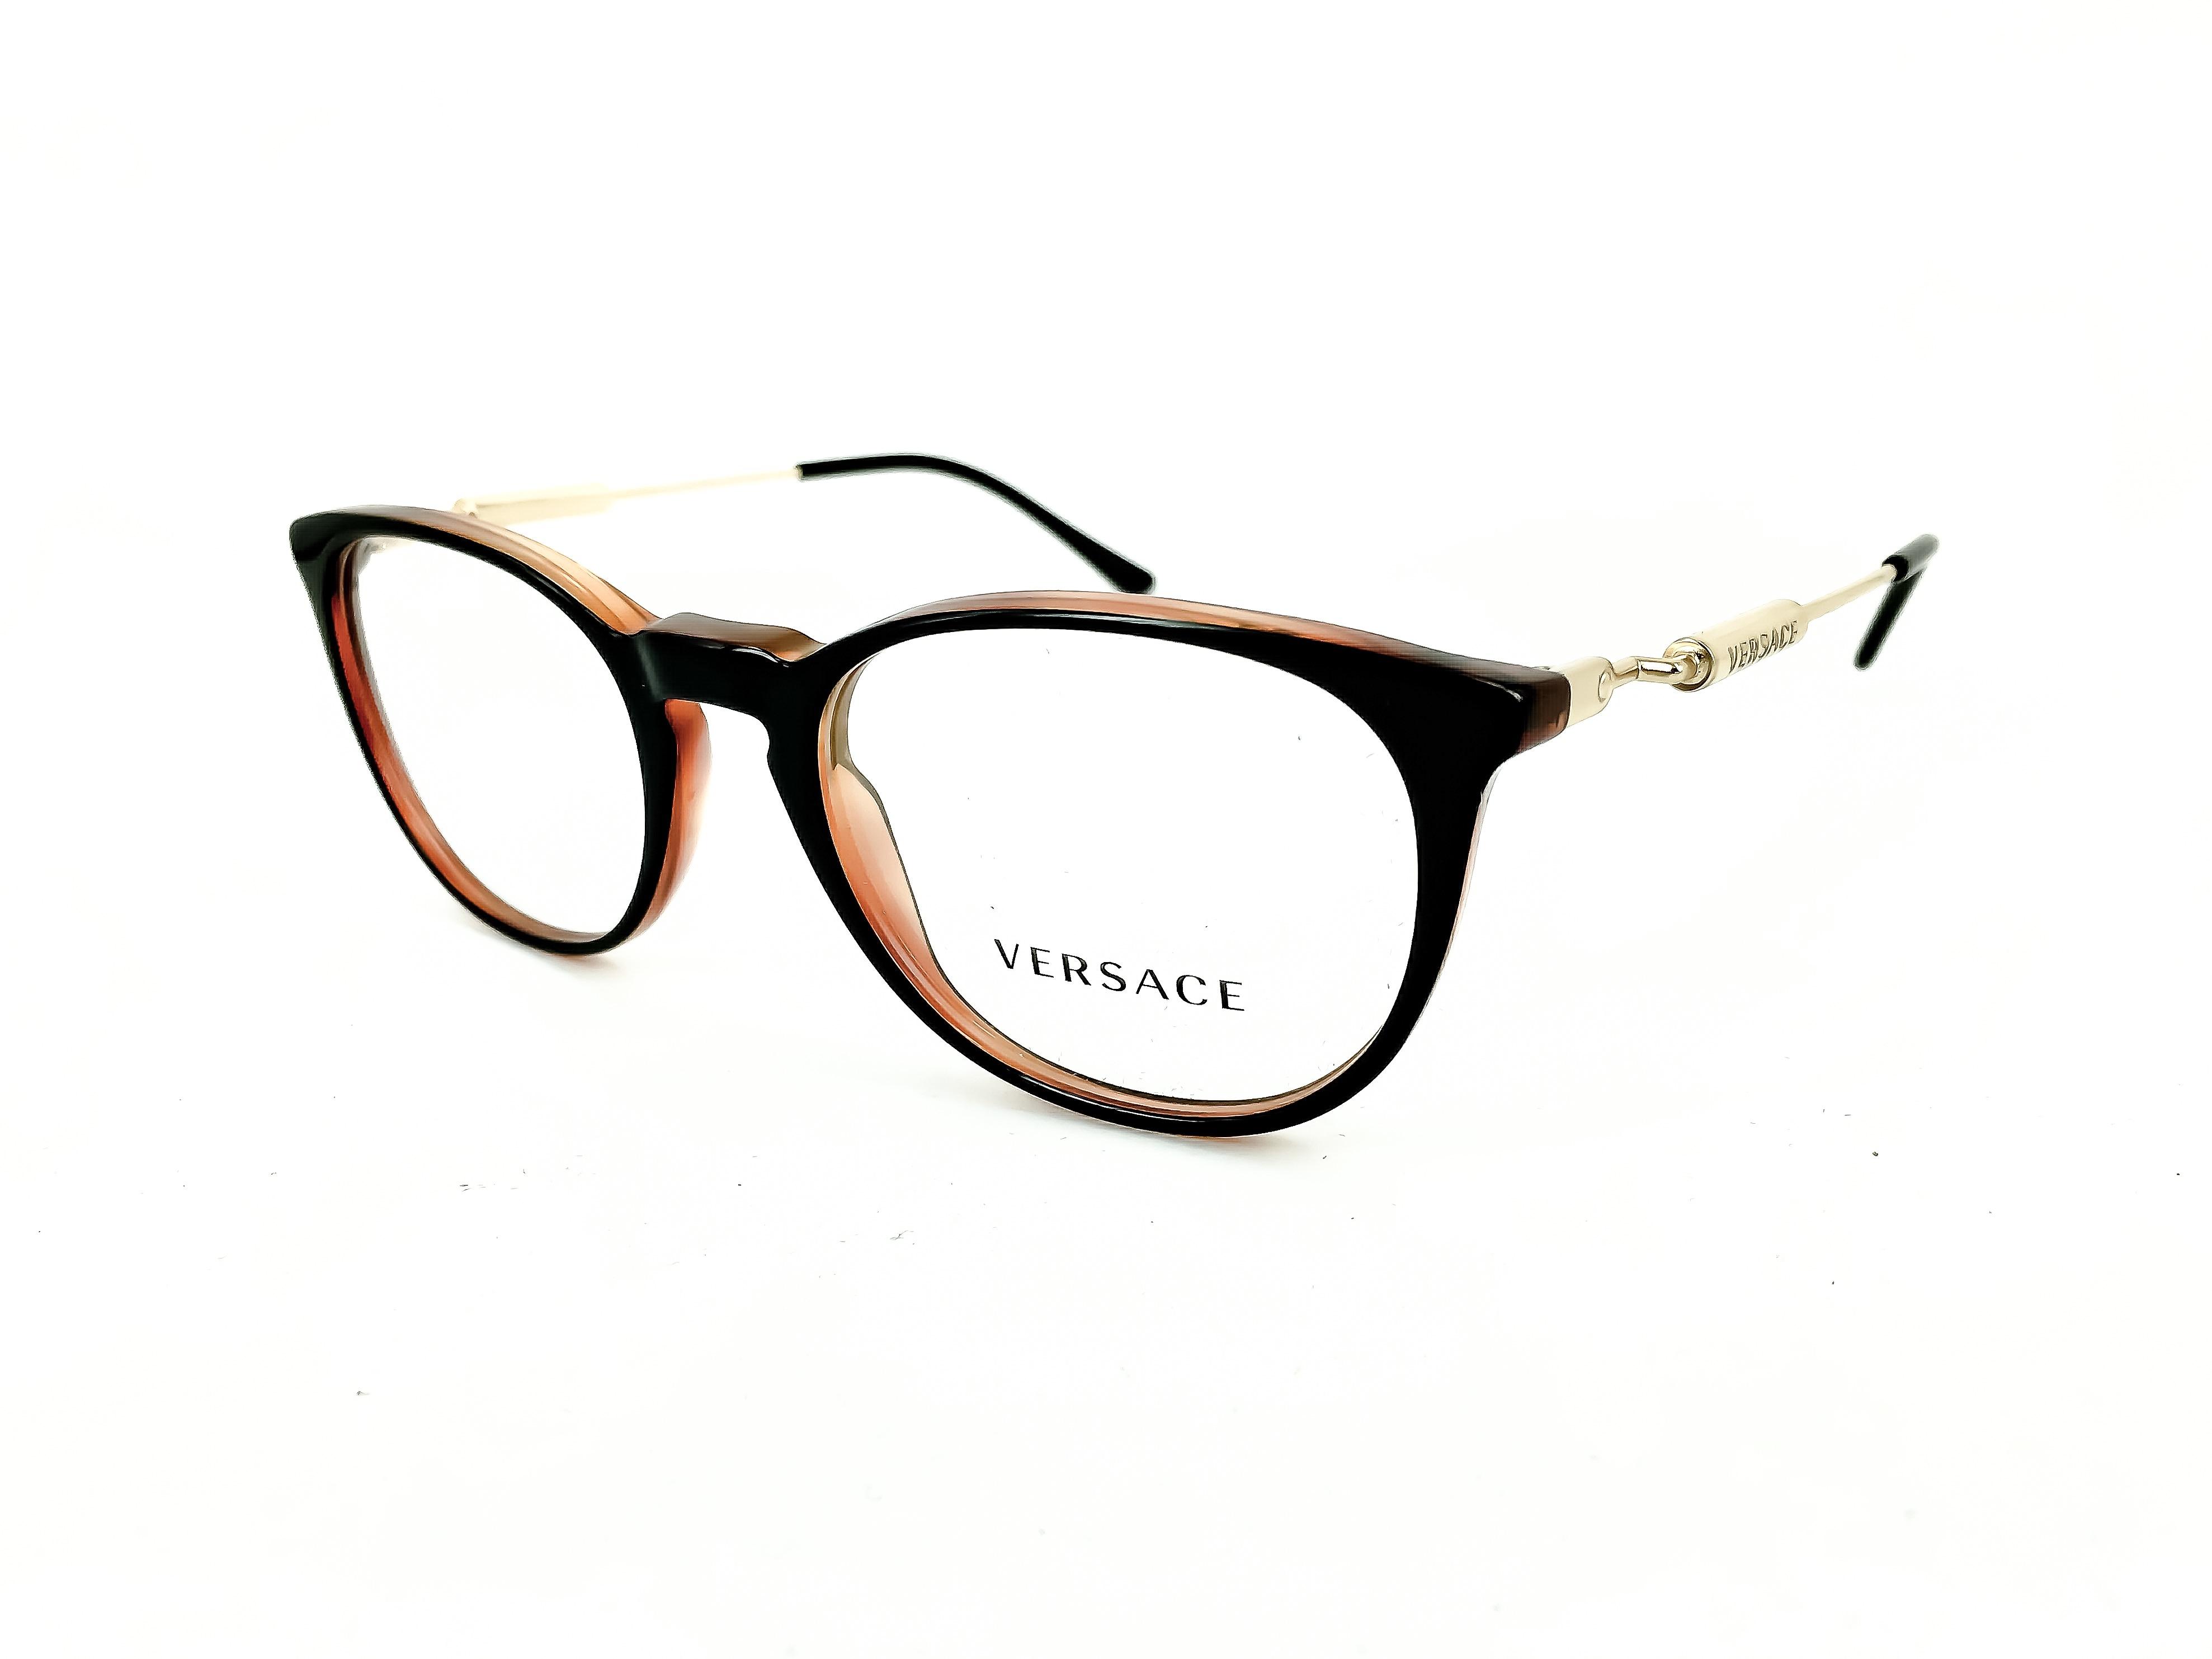 86f1616457 Τα γυαλιά οράσεως VERSACE 3227 138 51 έχουν ήπιο στρογγυλό σχήμα και  ταιριάζουν ιδανικά σε μικρά αλλά και μεσαία πρόσωπα.